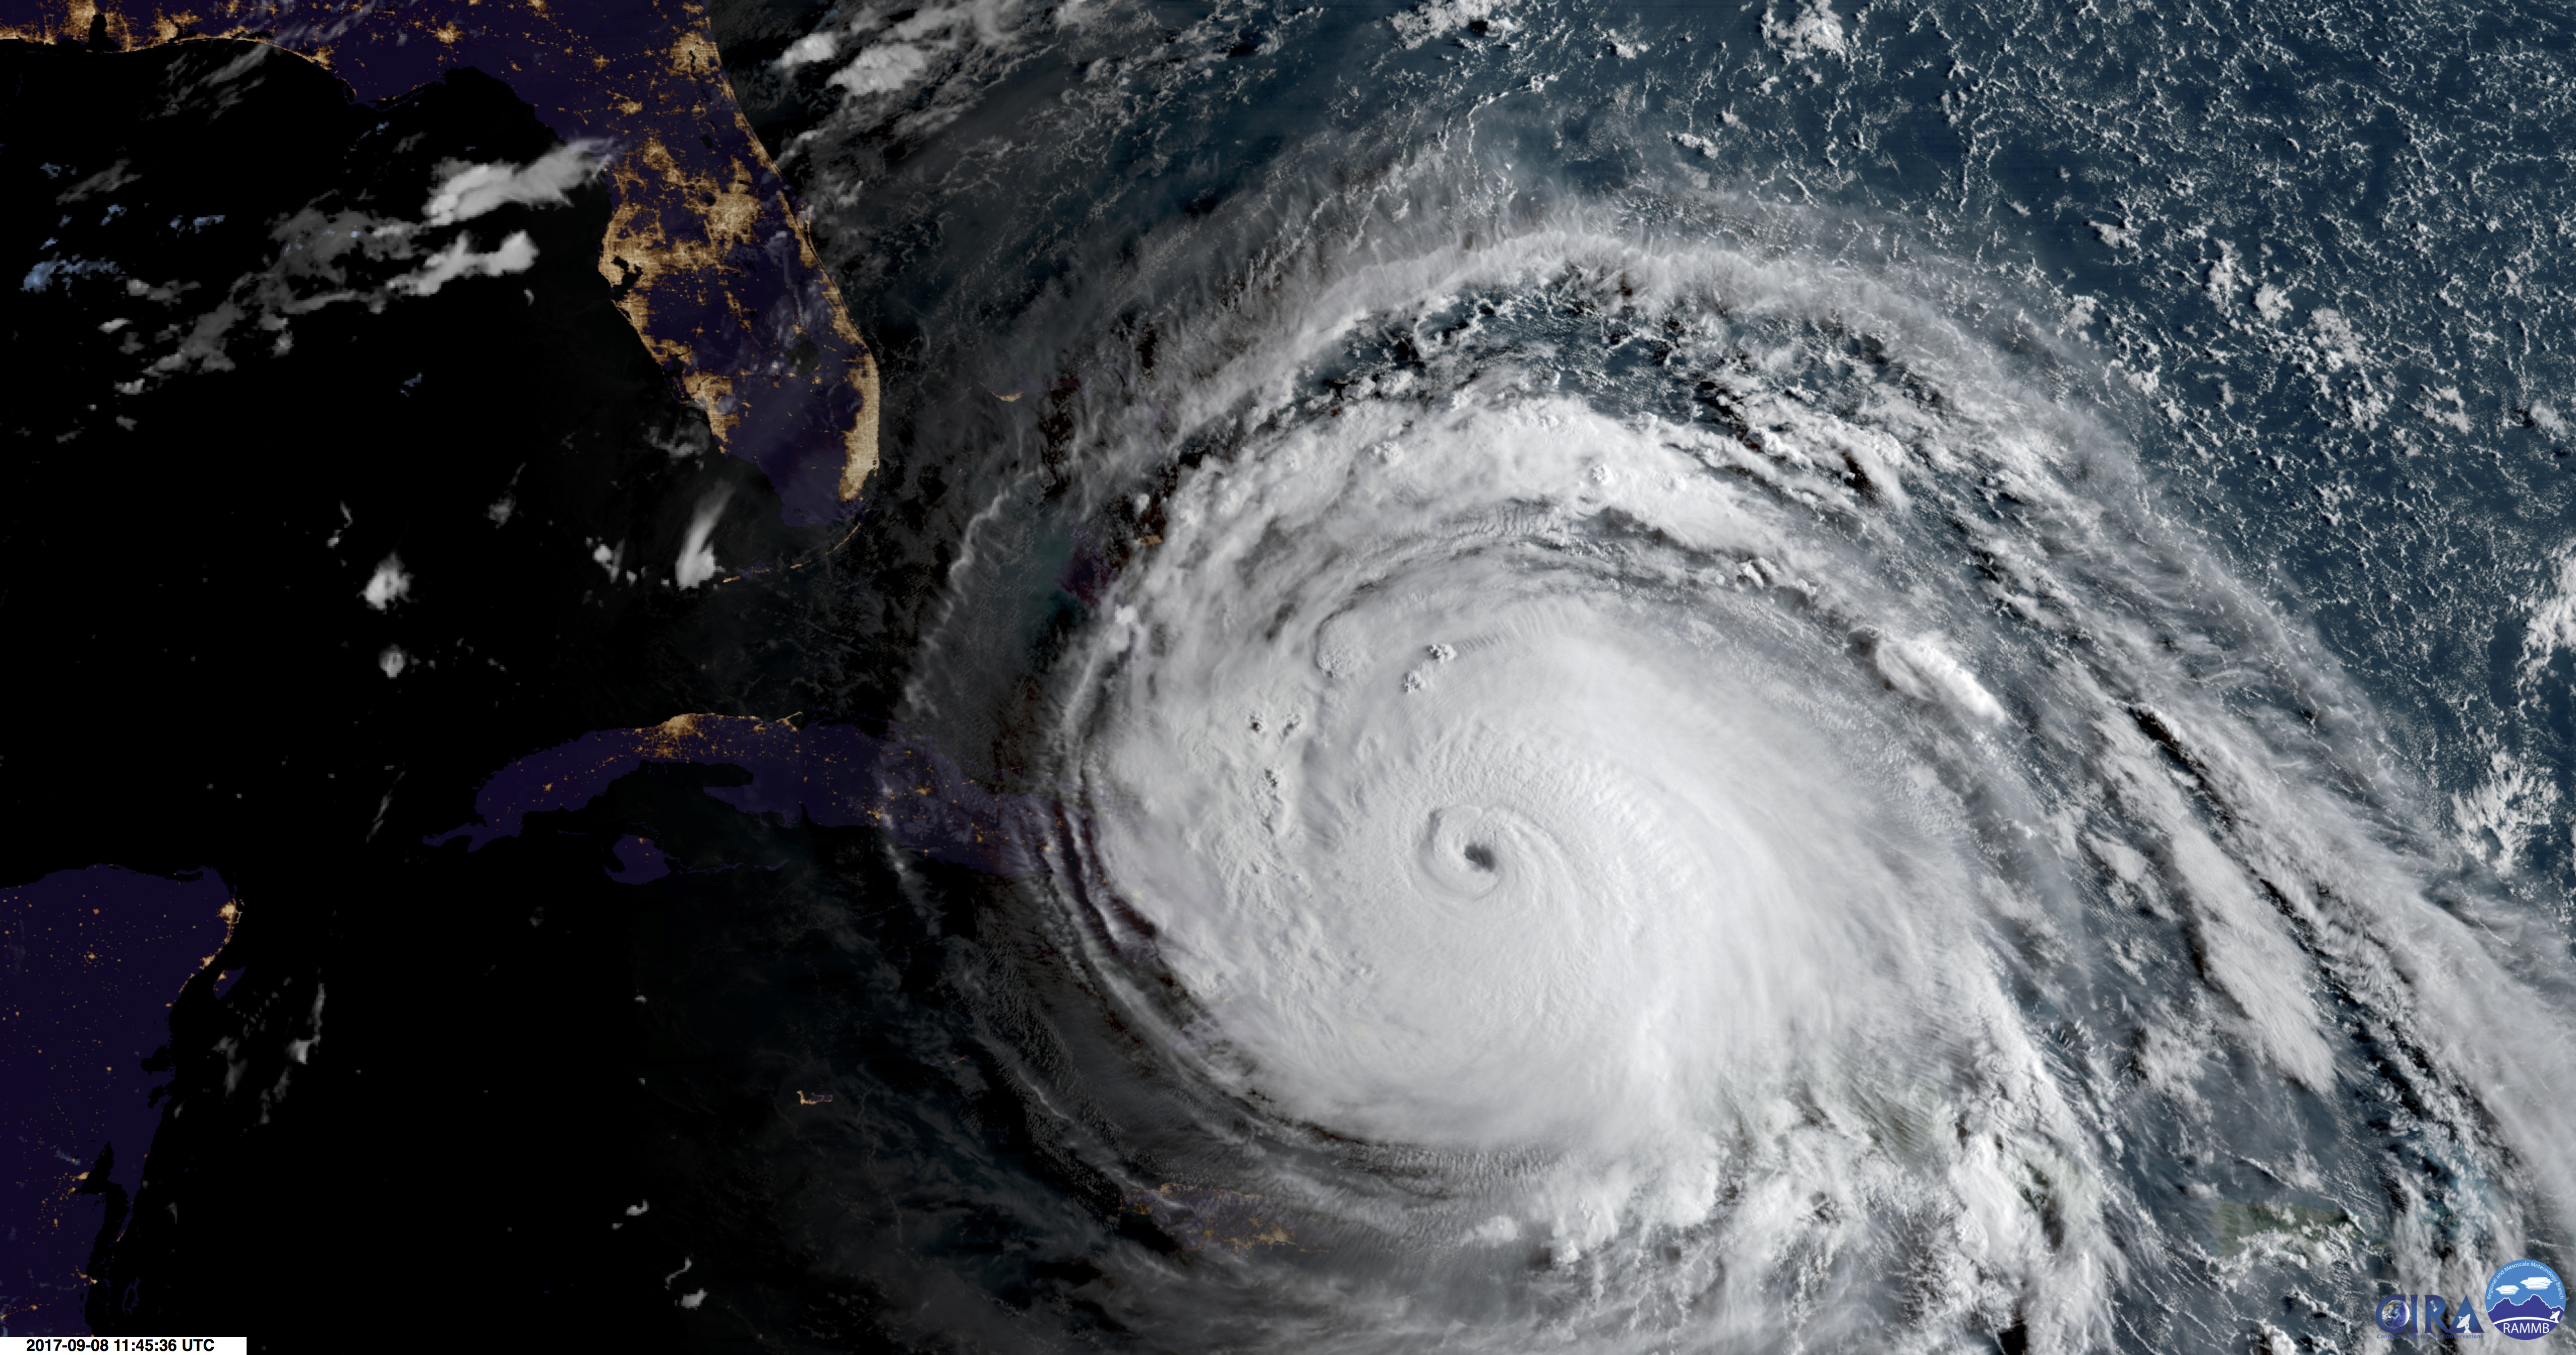 Satellite image of Hurricane Irma on Sept. 8, 2017.